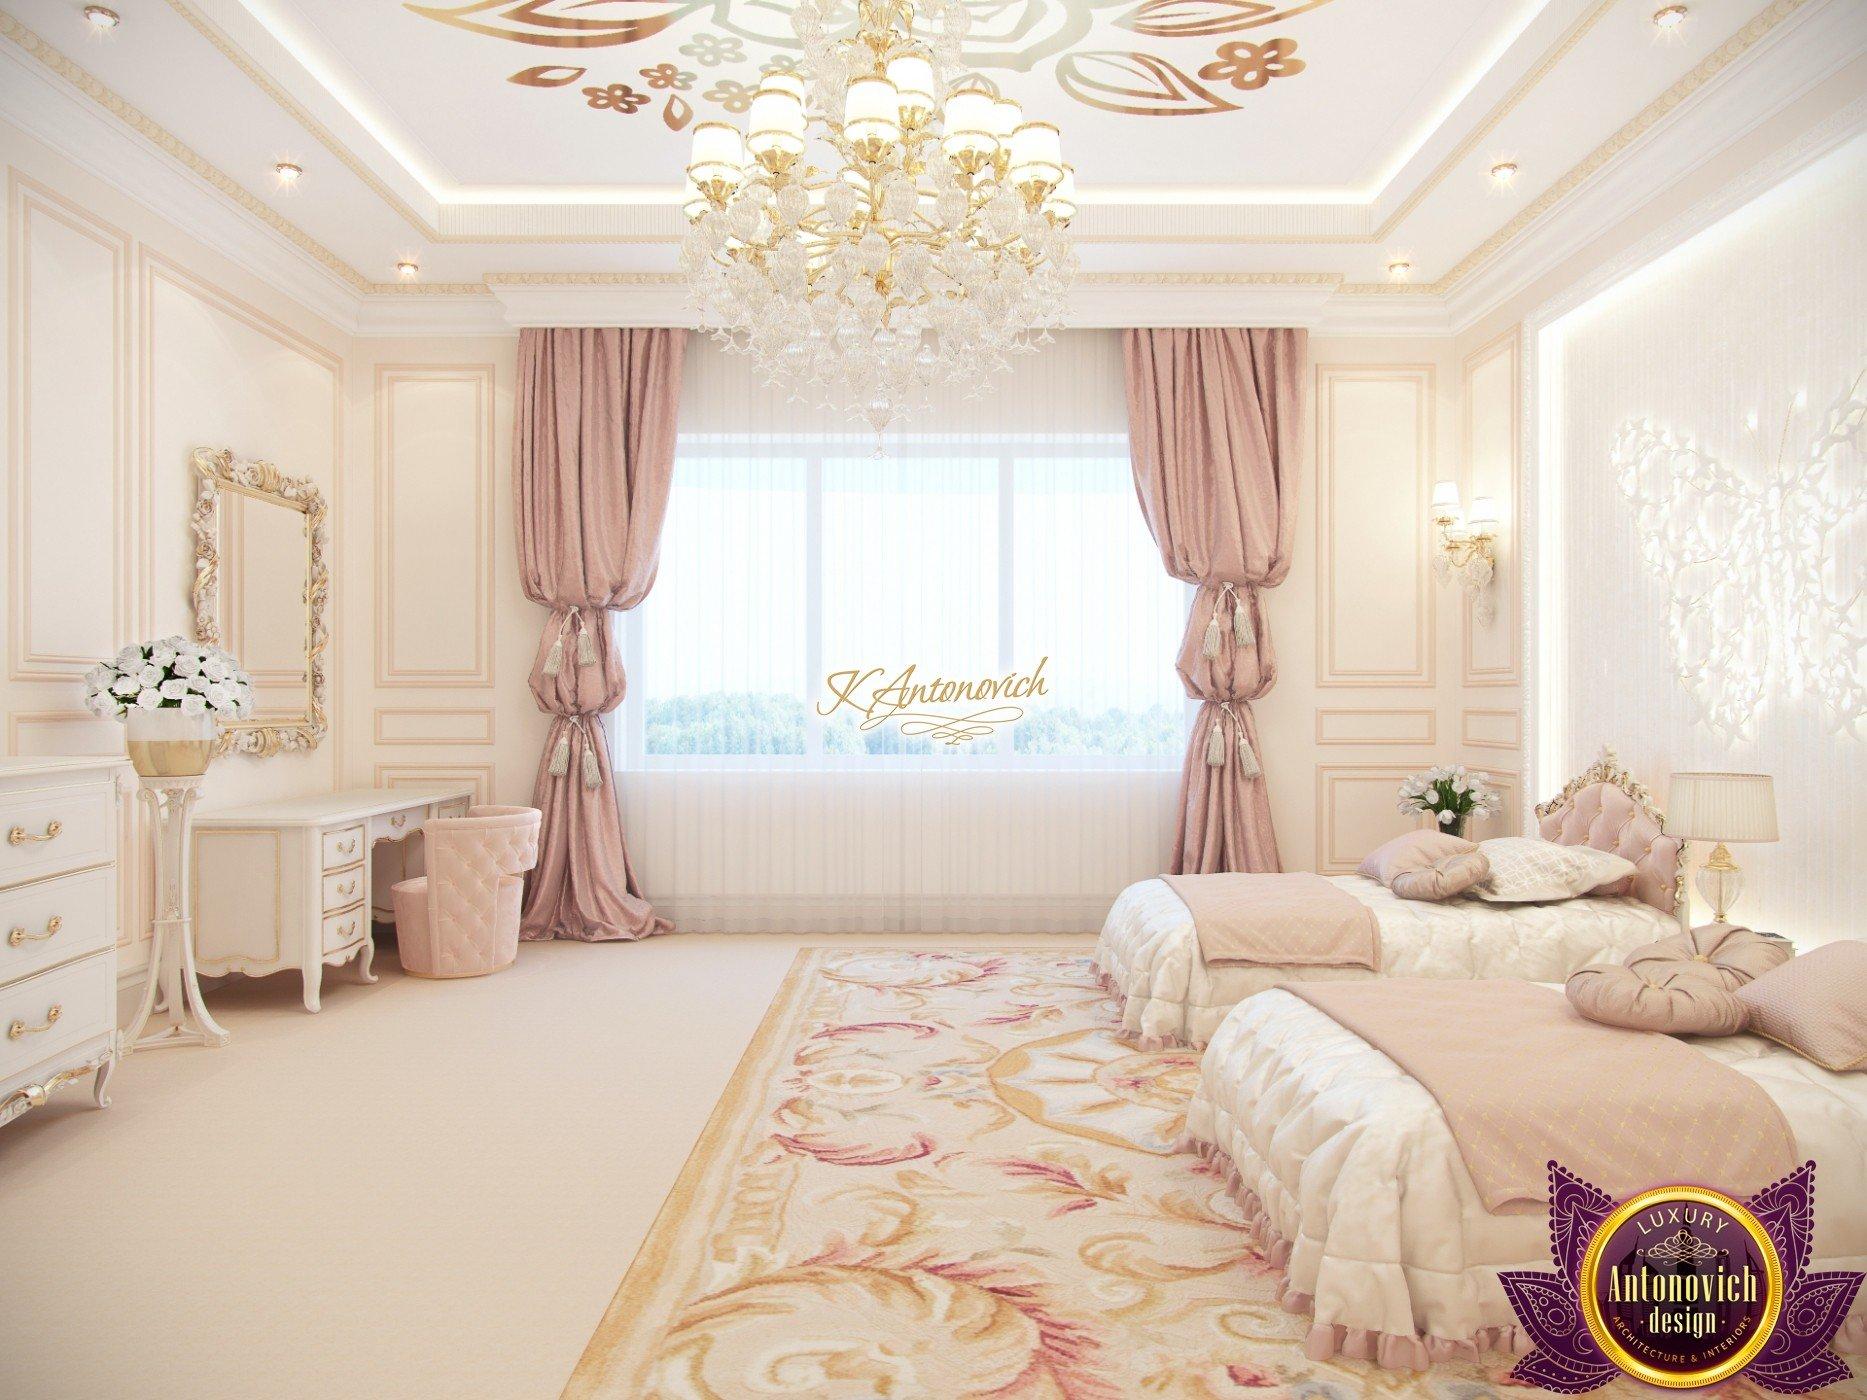 Kids bedroom for girls on Girls Room Decoration  id=31230